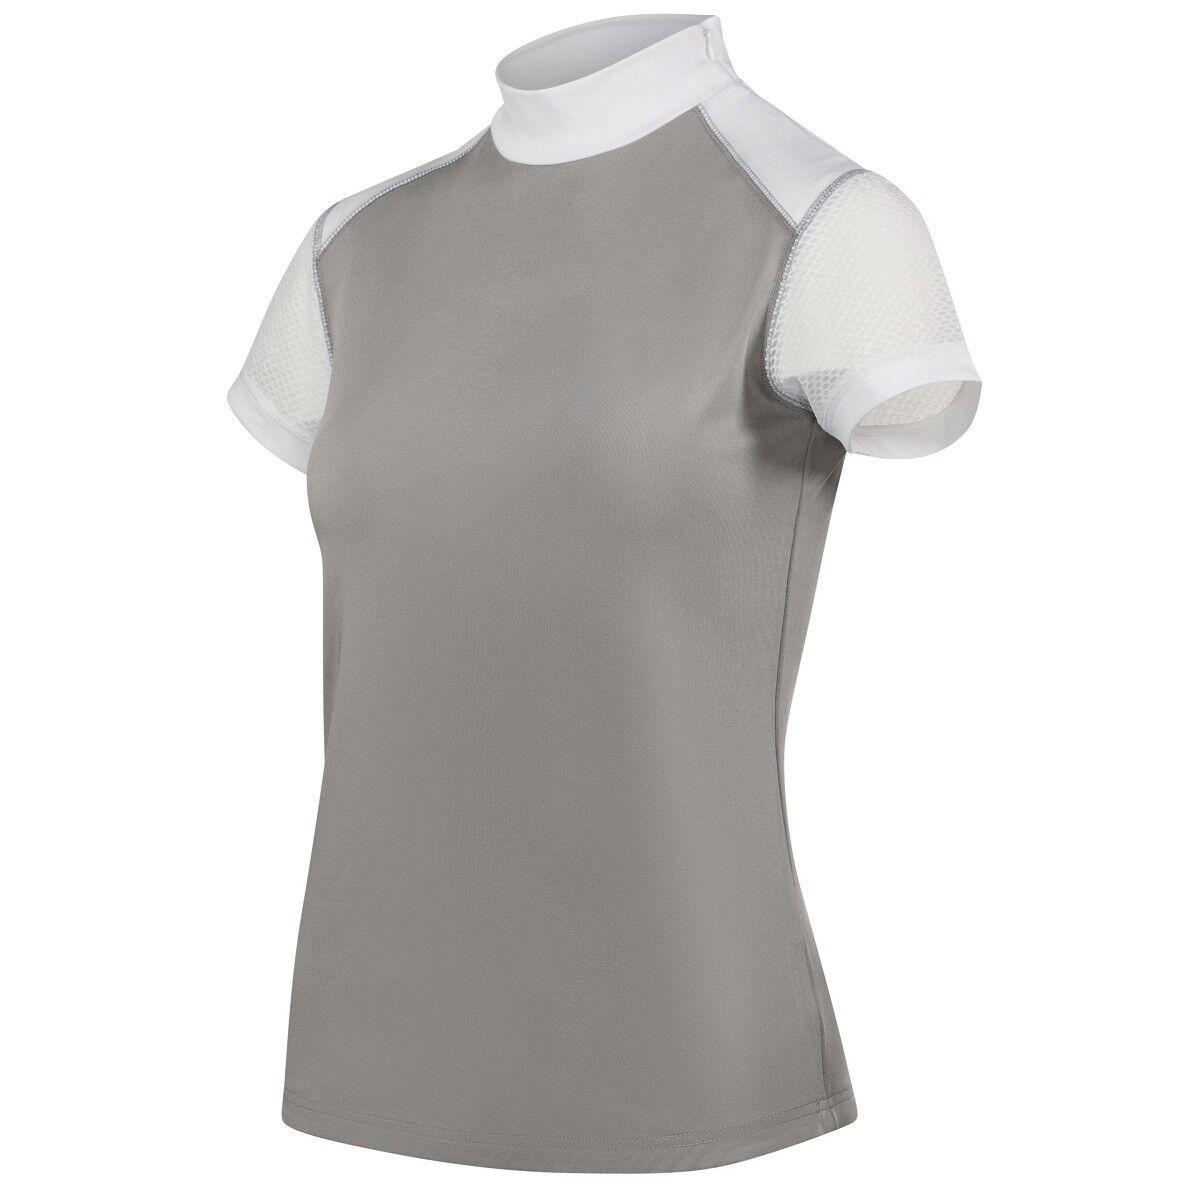 Bverdeigo gris, manga blancoa, cierre lateral, malla axila, camisa